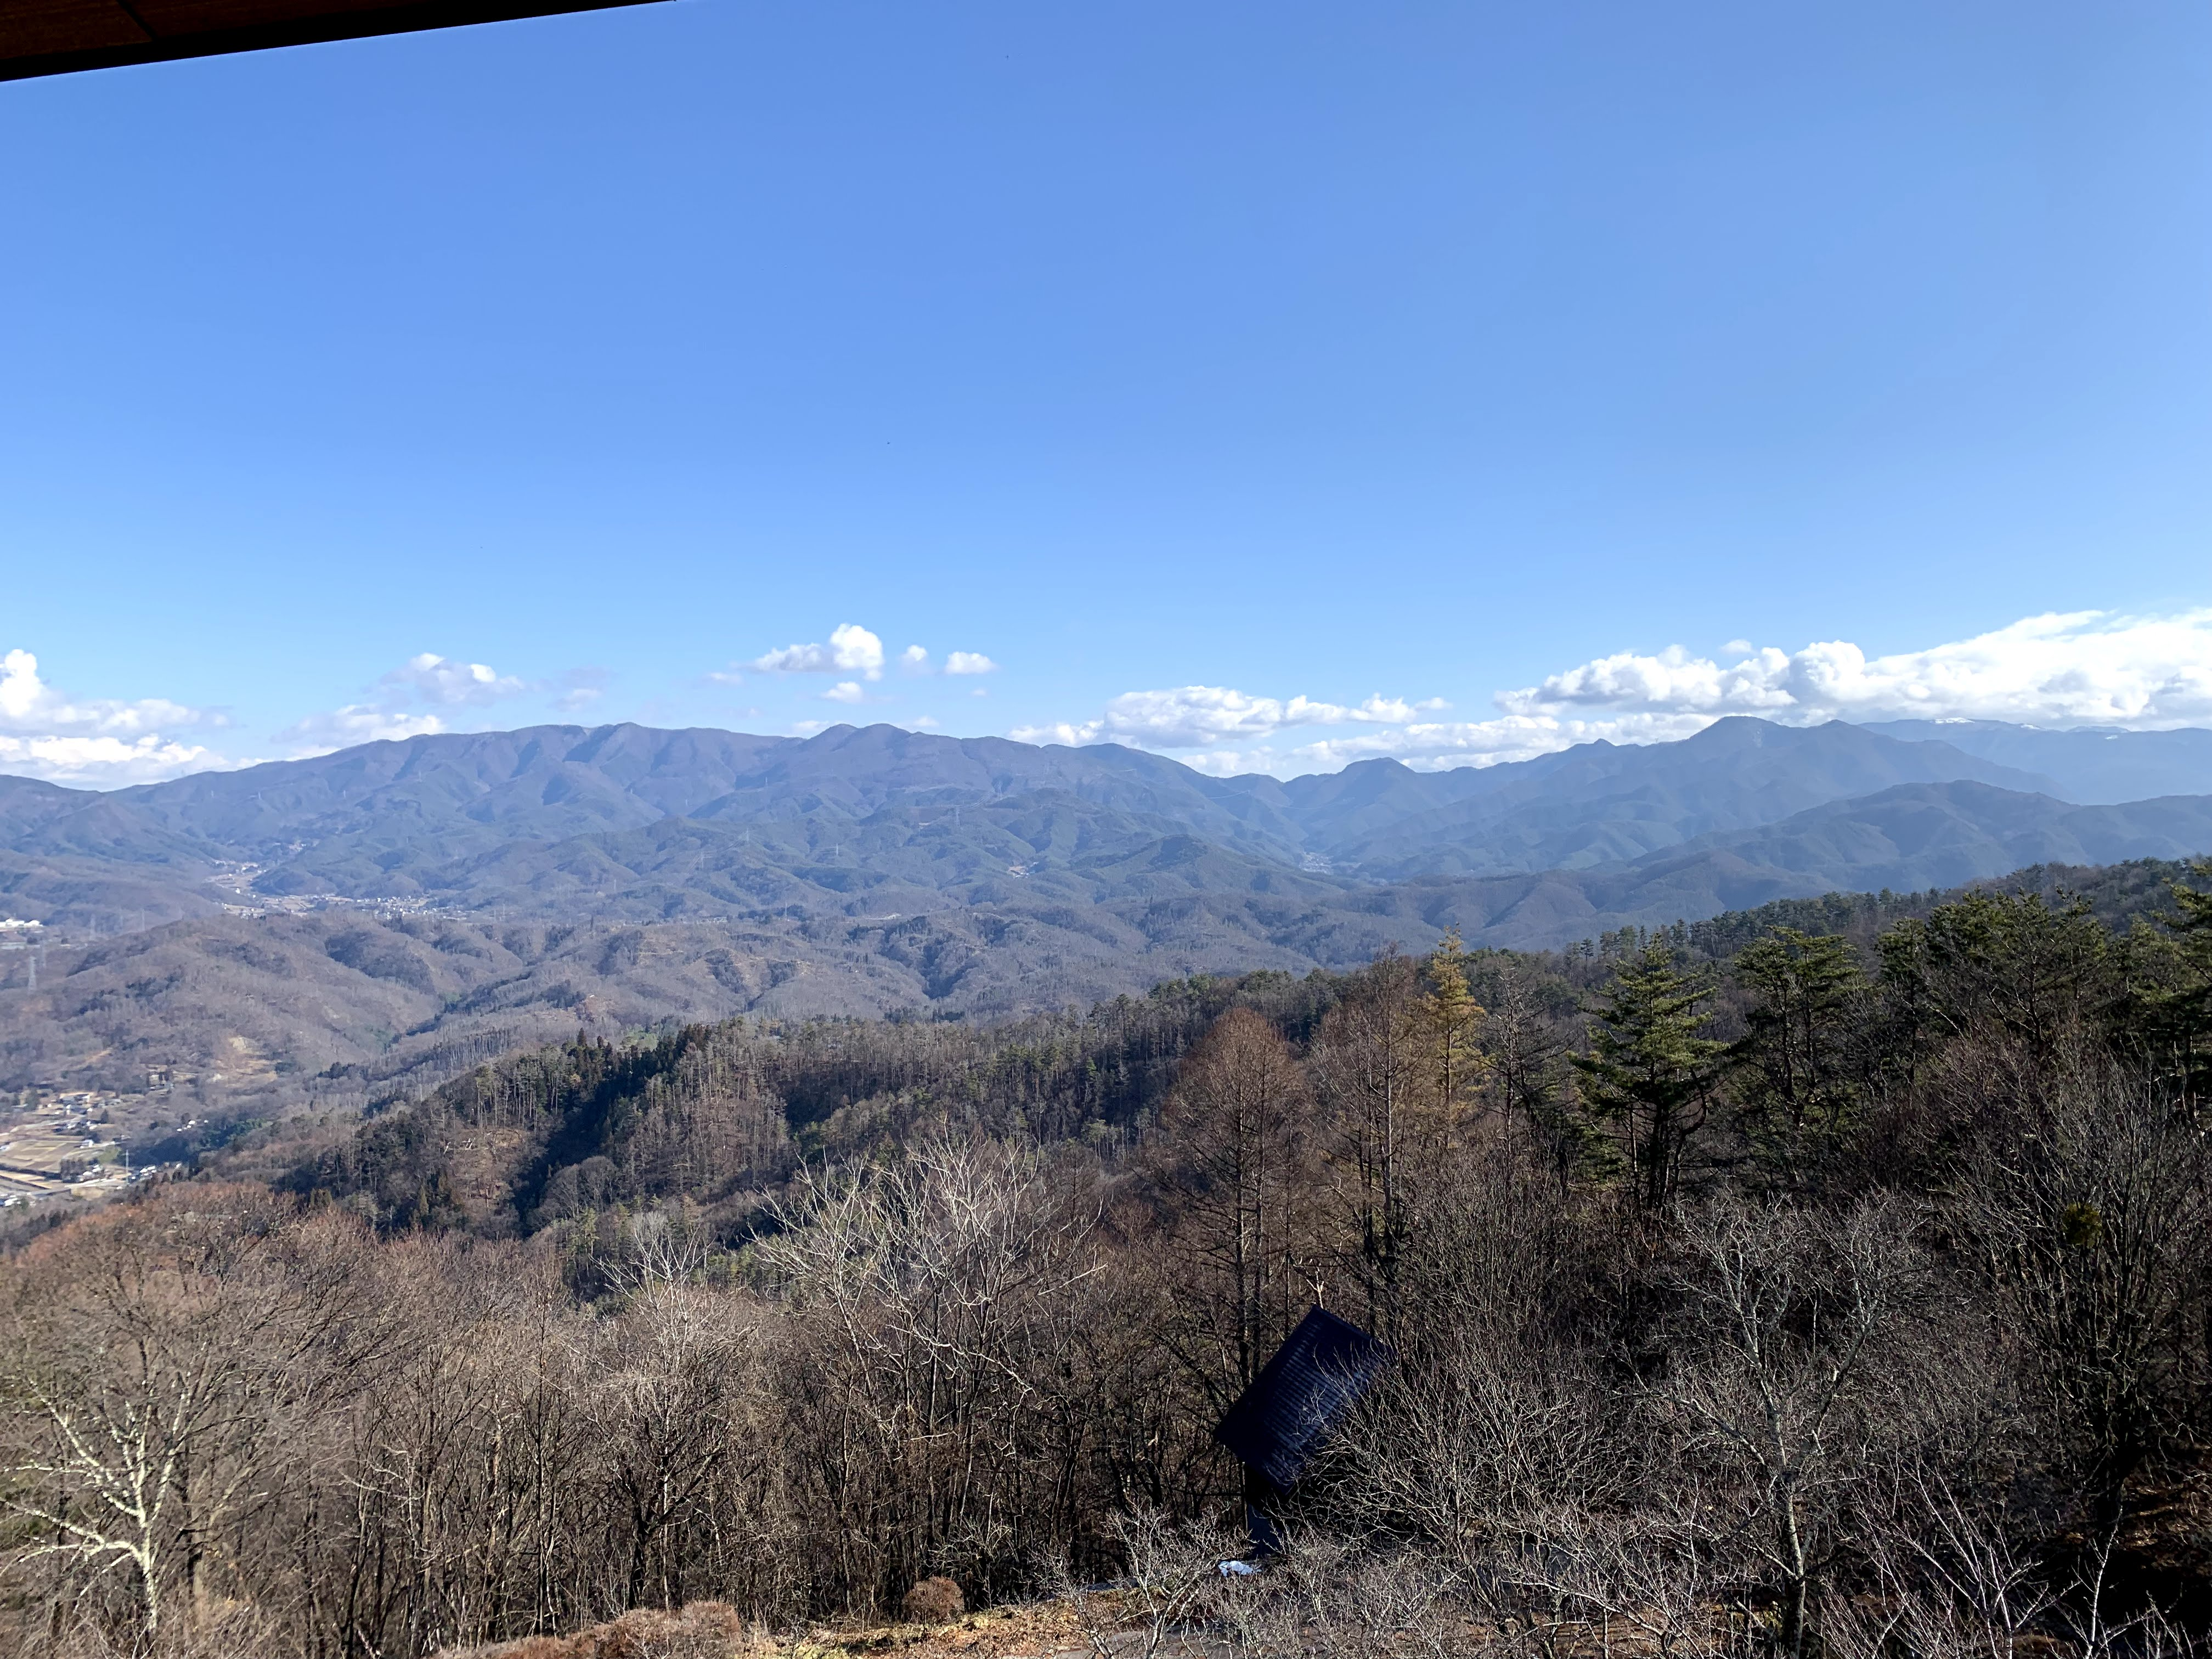 光城山、長峰山